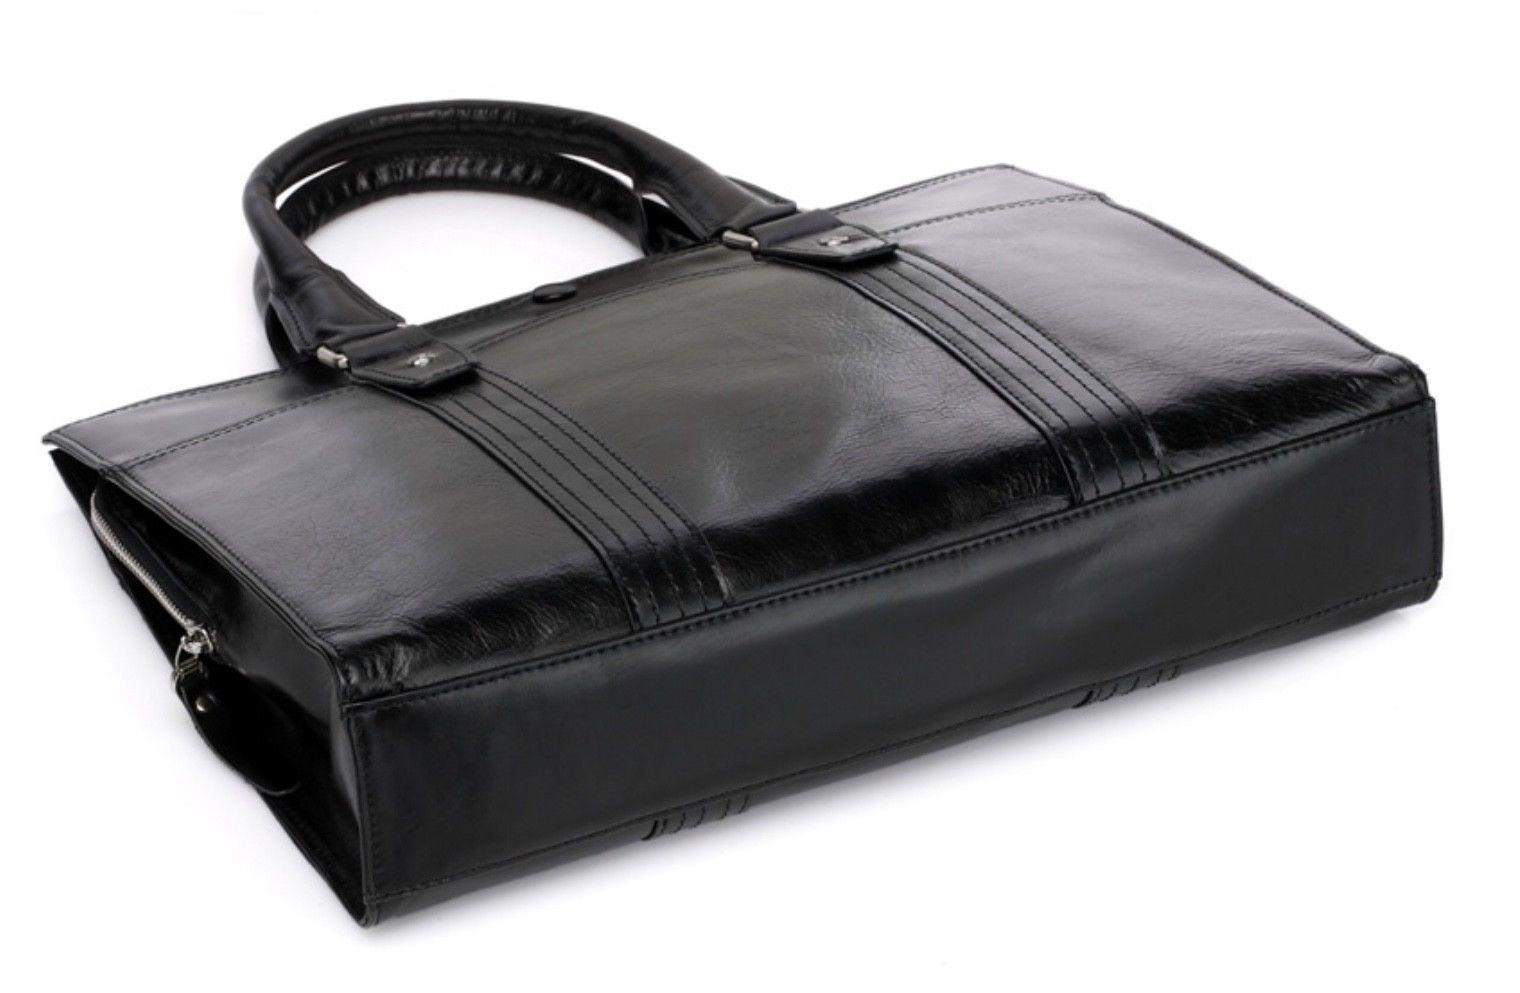 Mens Black Italian Leather Business Bag Briefcase Laptop Case Messenger Bag